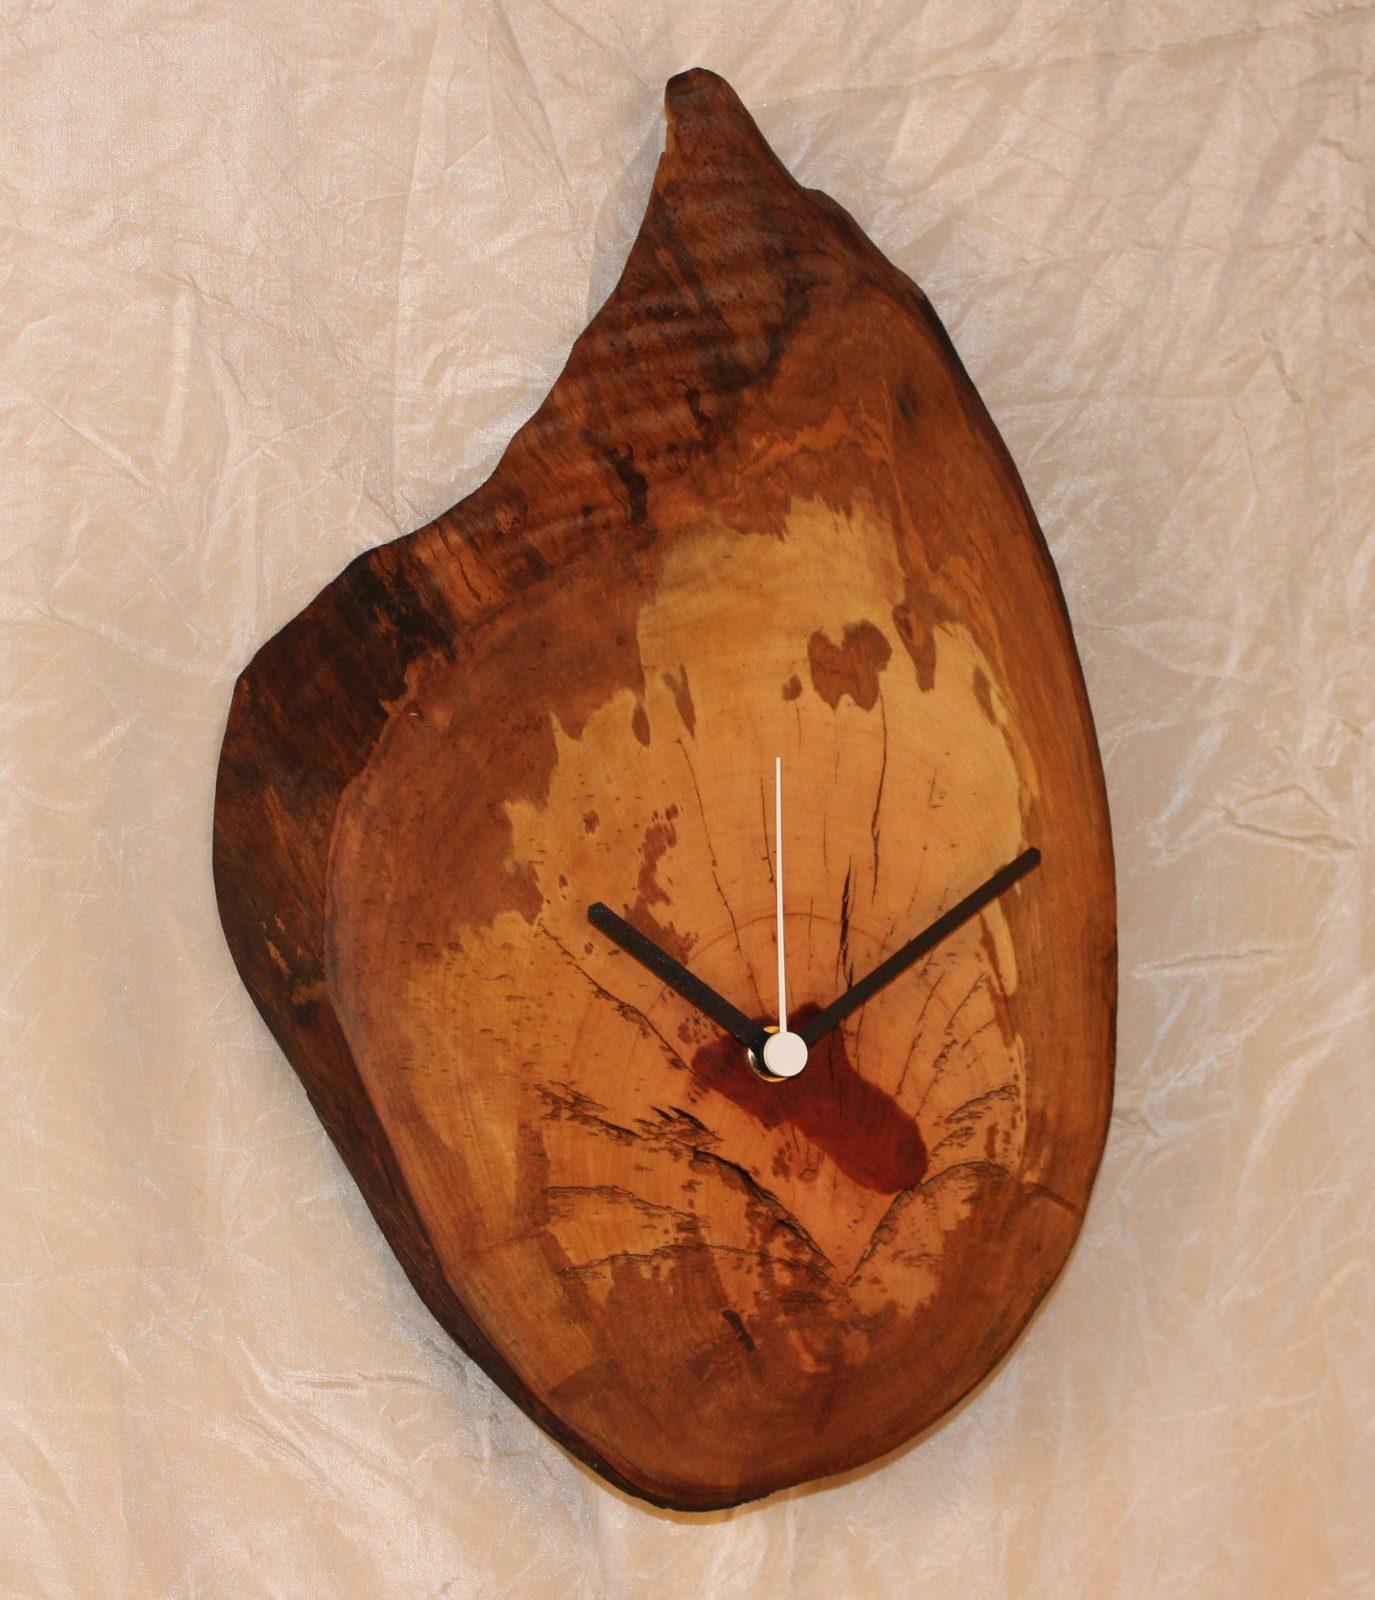 Holz Wanduhr Best 25 Wanduhr Holz Ideas On Pinterest Uhr Holz Diy von Wanduhr Aus Holz Selber Bauen Photo